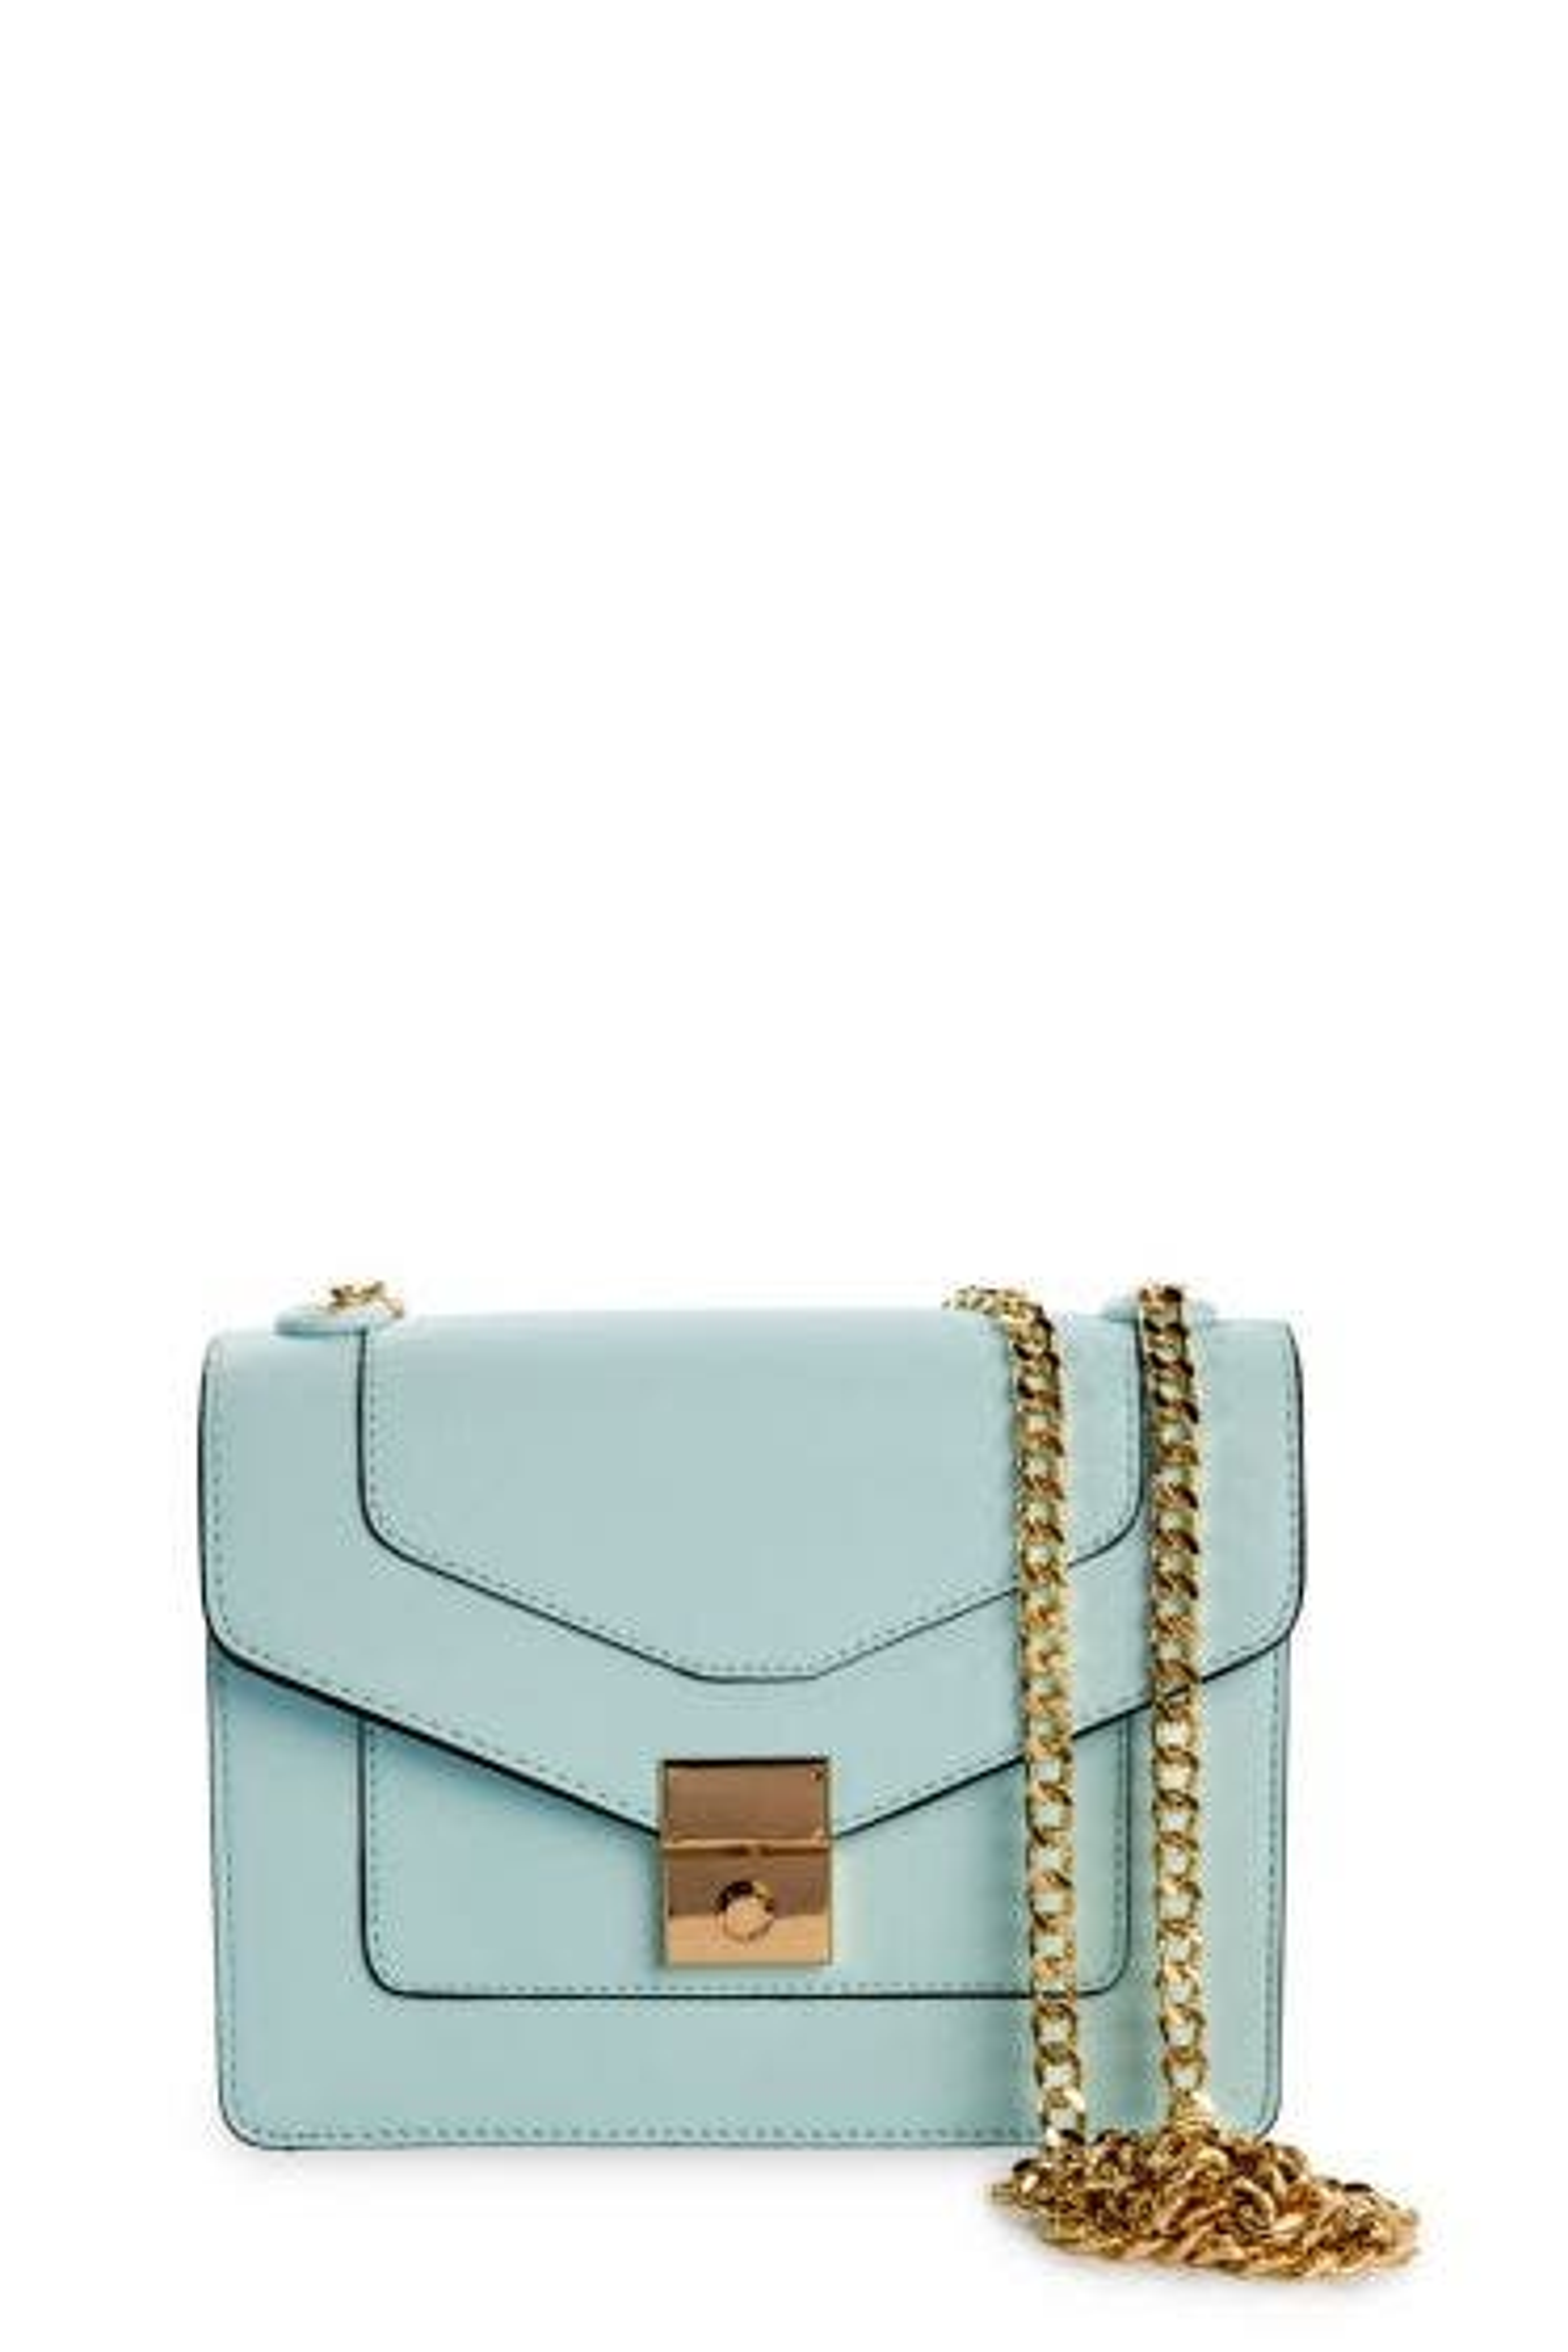 BLUE-BAG19004